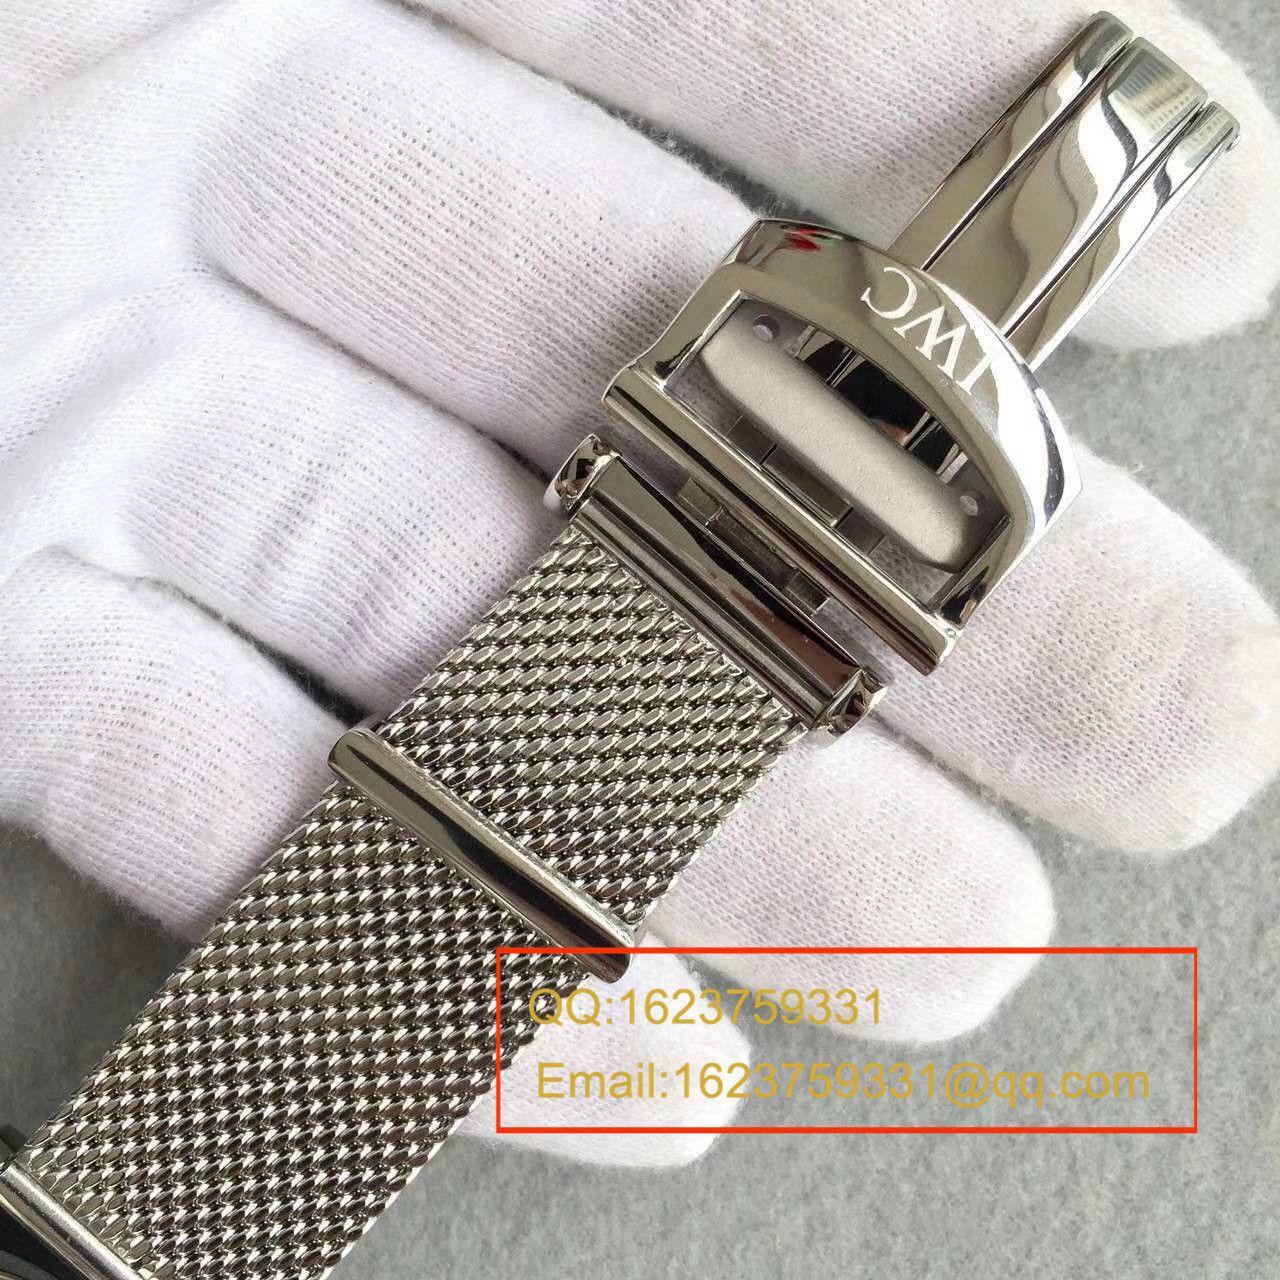 【MKS厂顶级复刻手表】万国柏涛菲诺CHRONOGRAPH计时系列 IW391009腕表 / WB0133